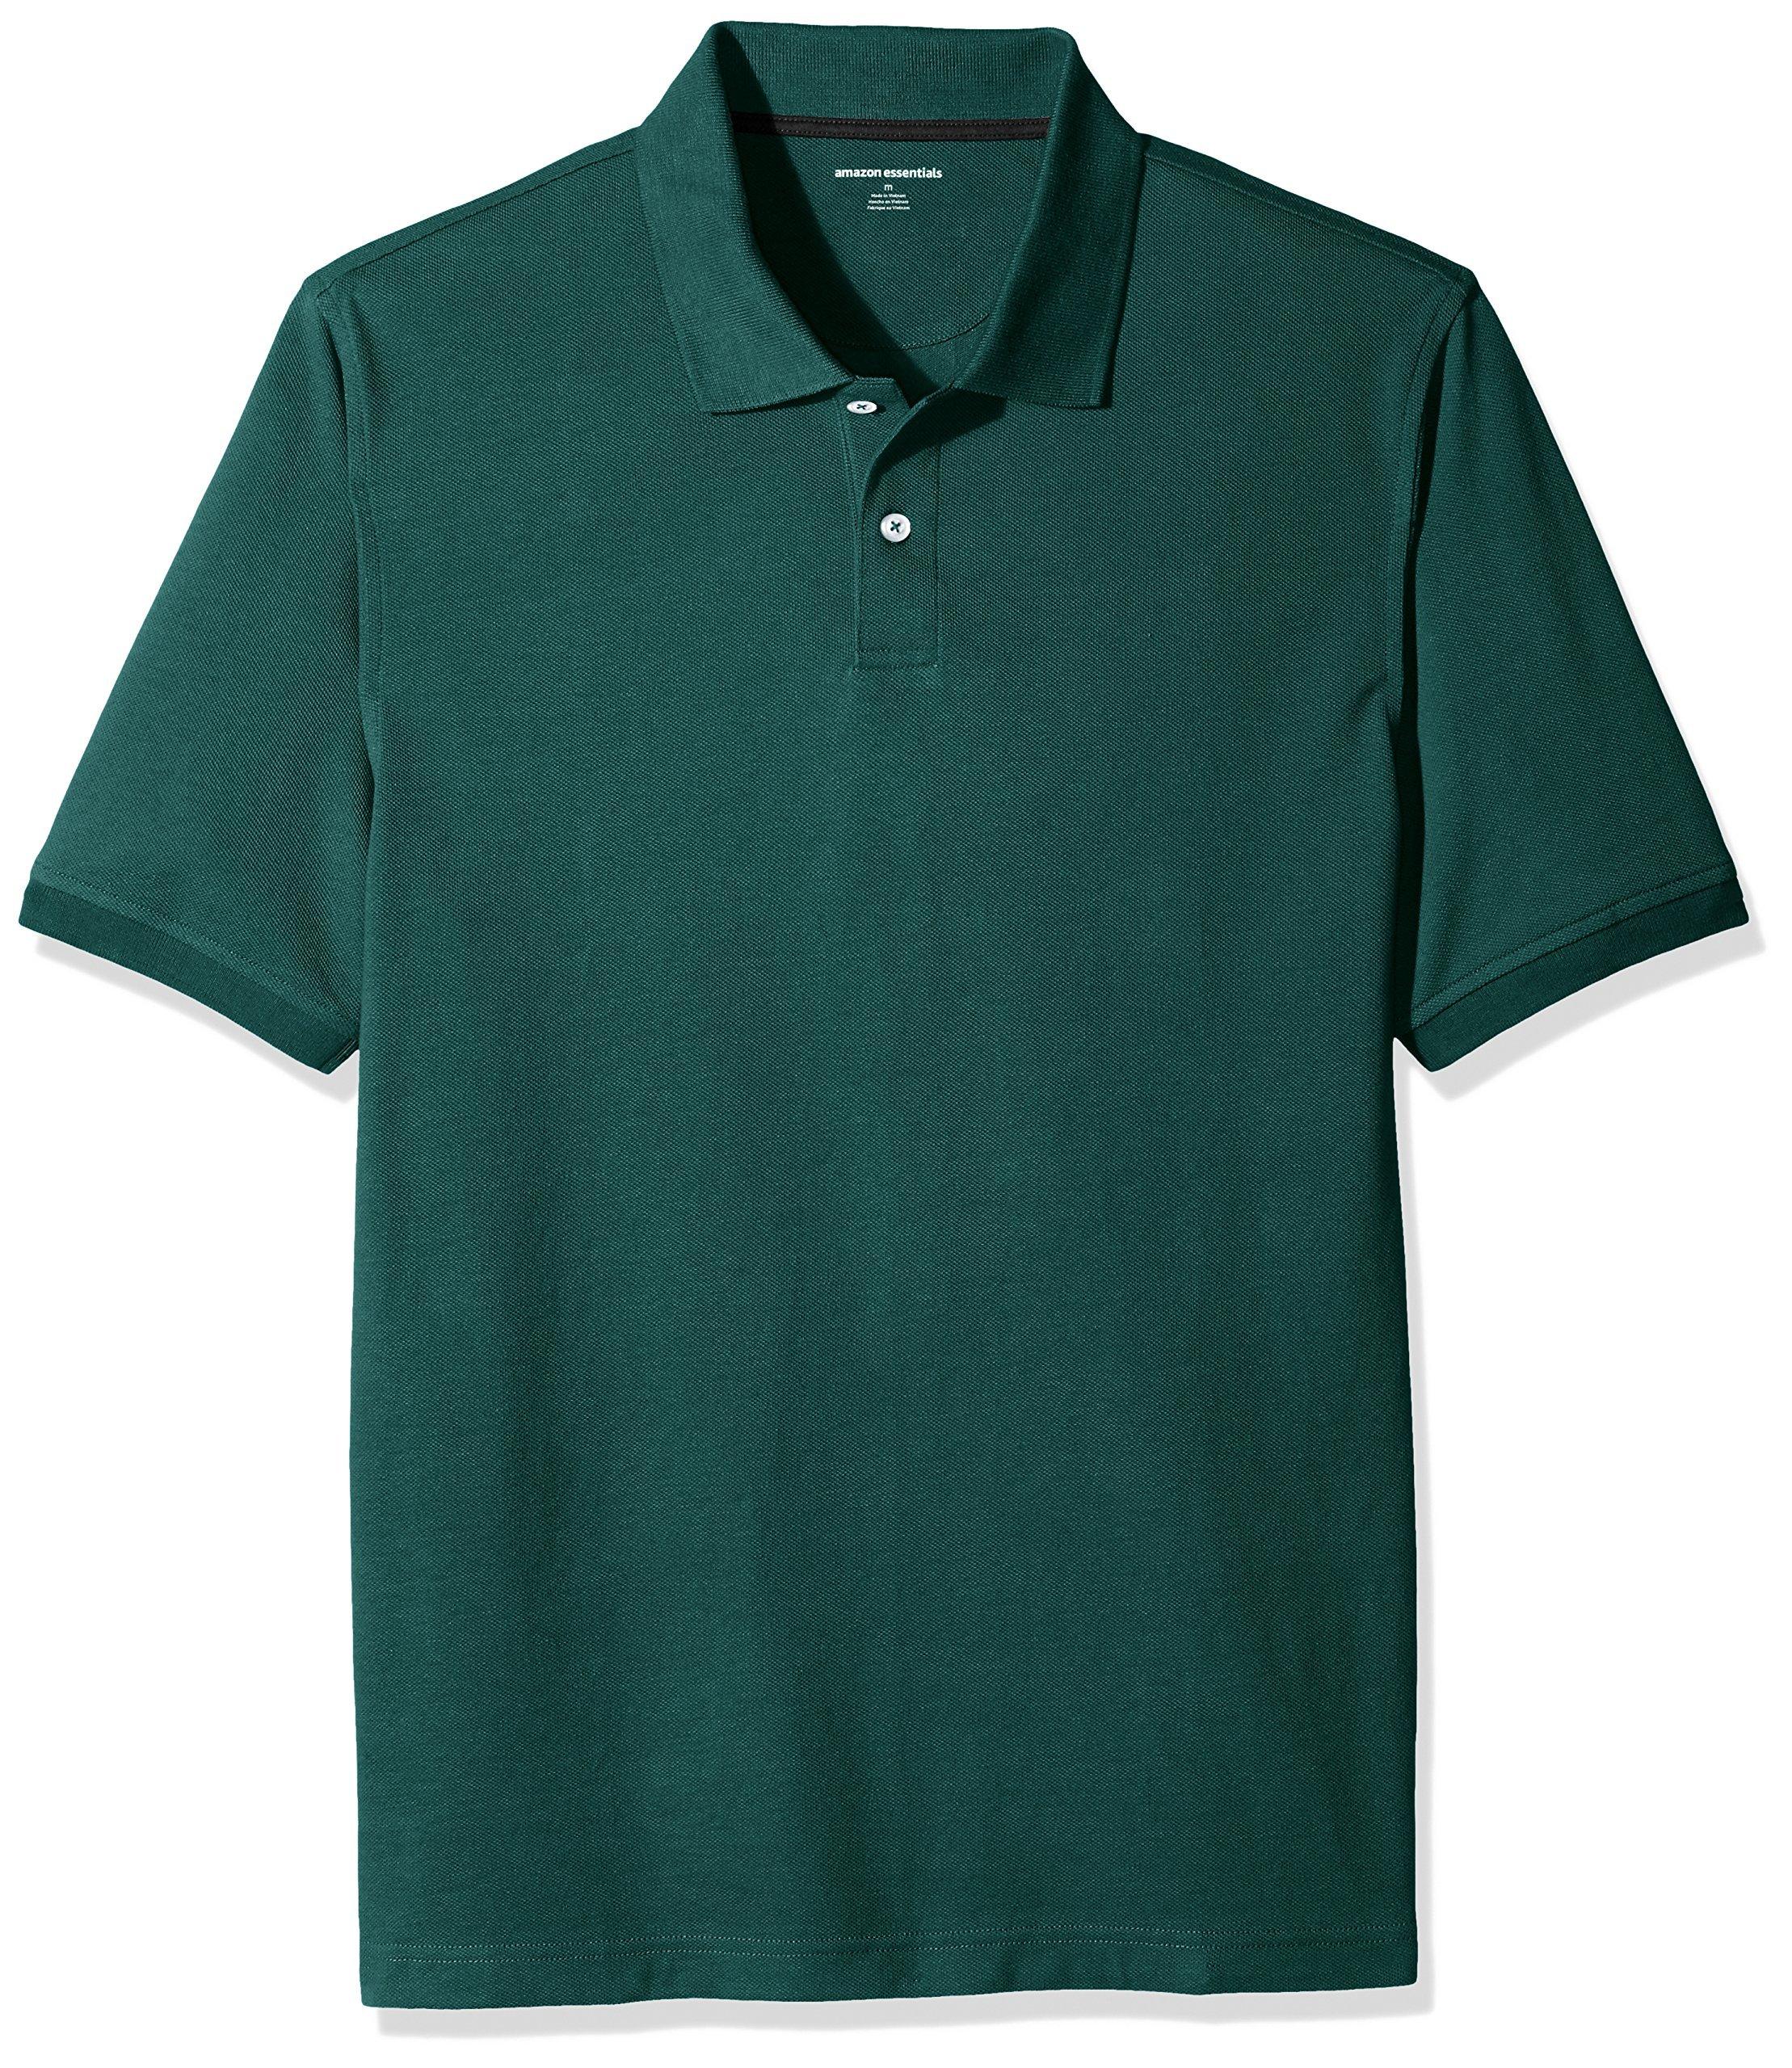 Amazon Essentials Men's Regular-Fit Cotton Pique Polo Shirt, Hunter Green, XX-Large